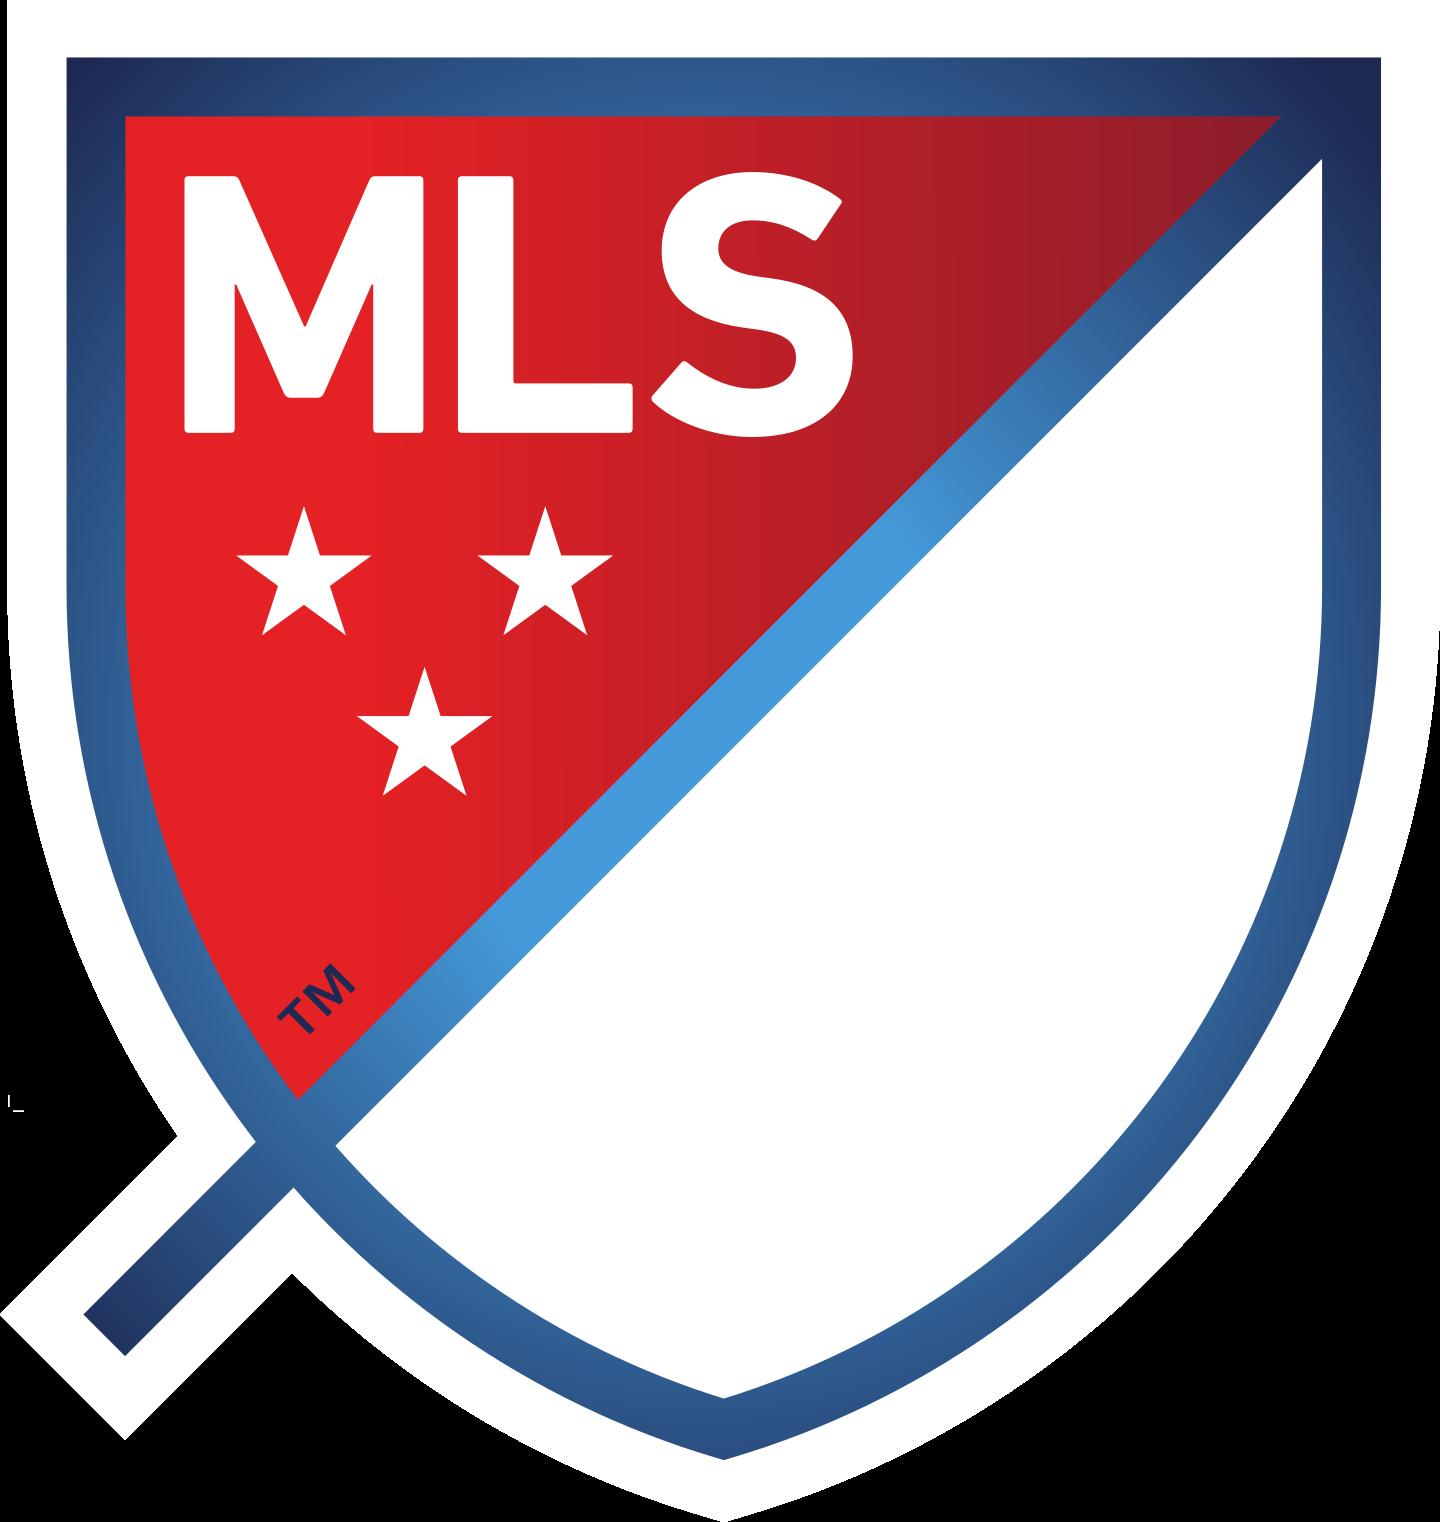 mls logo 2 - MLS Logo - Major League Soccer Logo